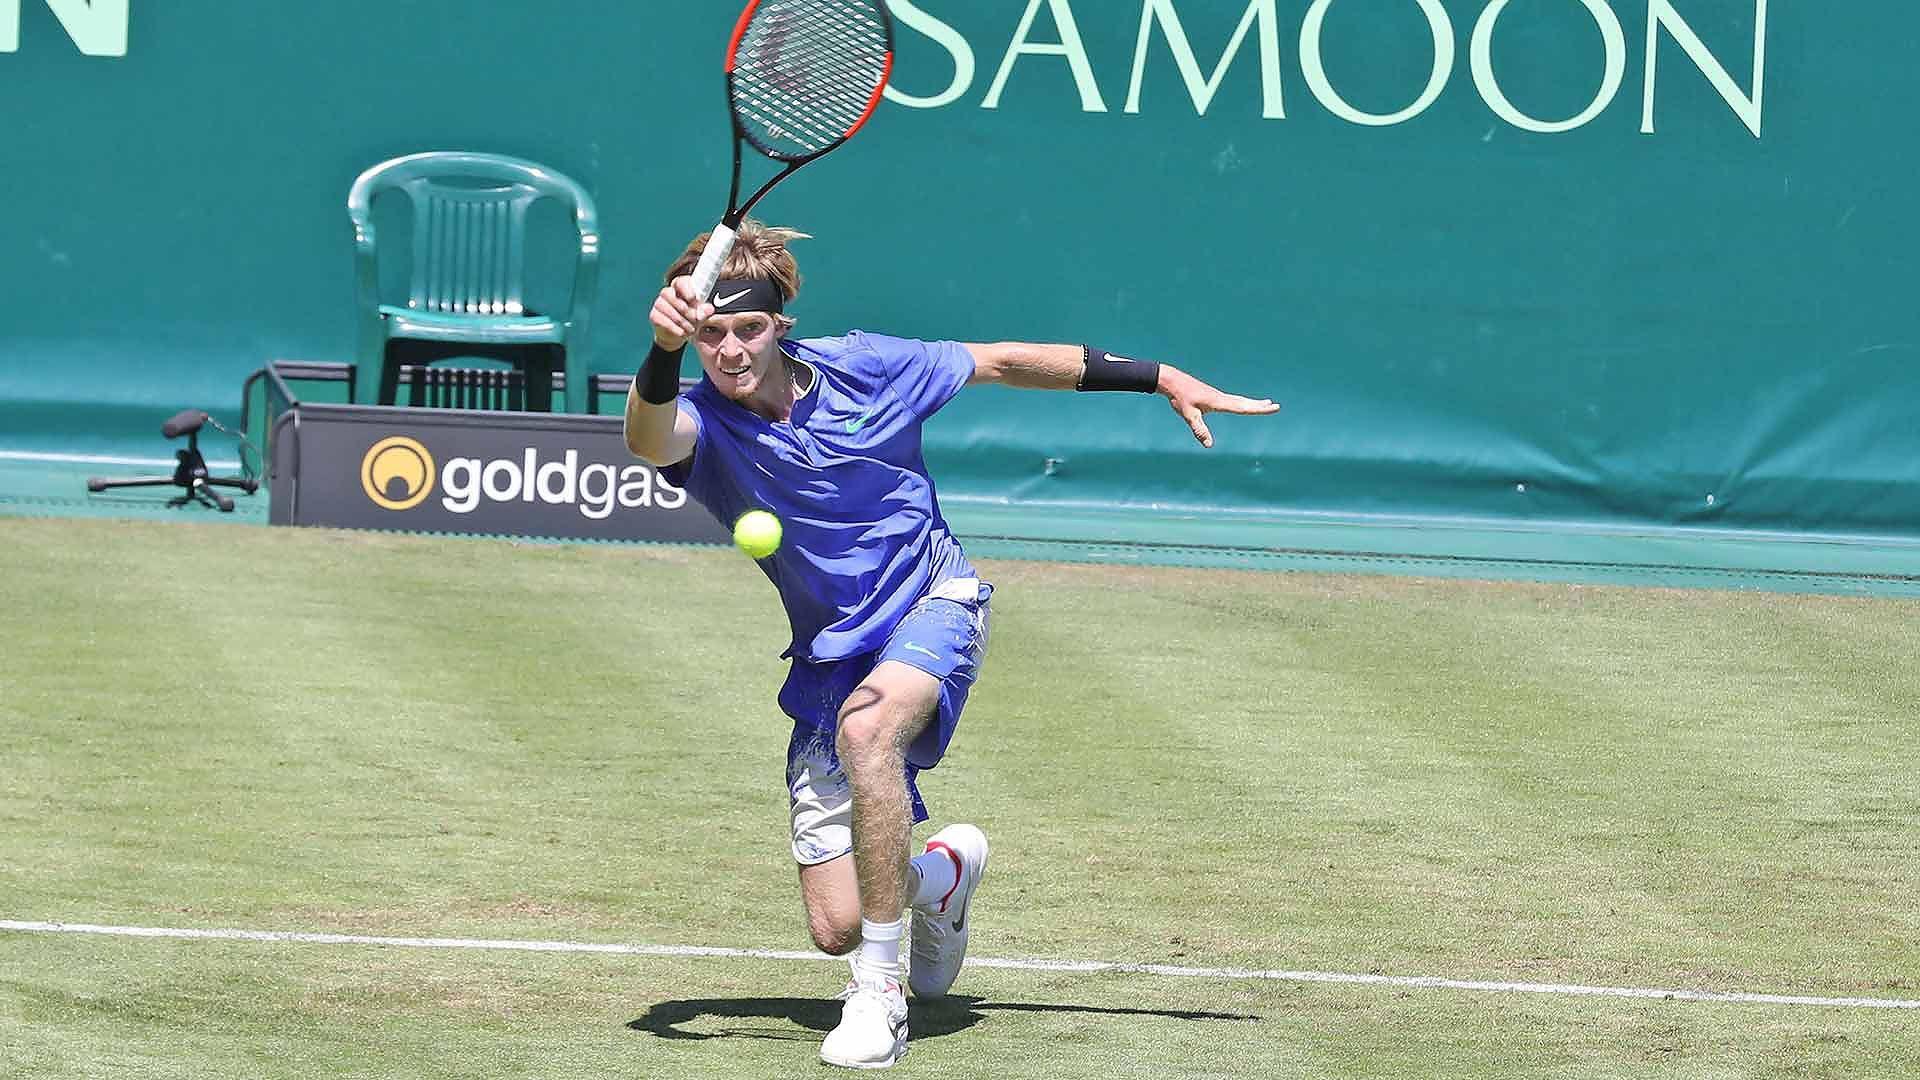 Wimbledon Championships 2021: Andrey Rublev vs. Federico Delbonis Tennis Pick and Prediction